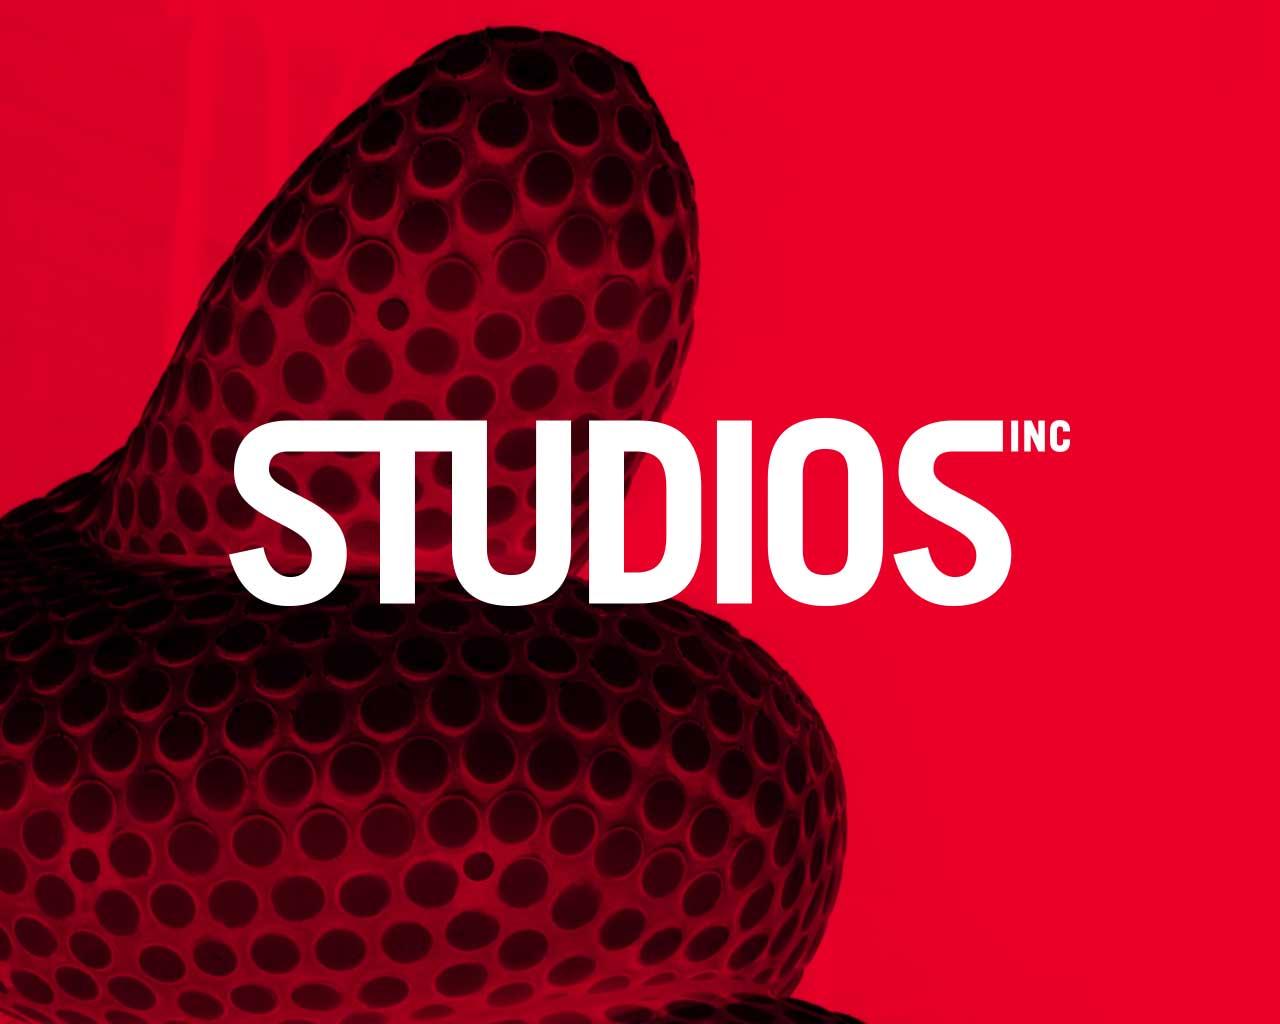 Studios Inc